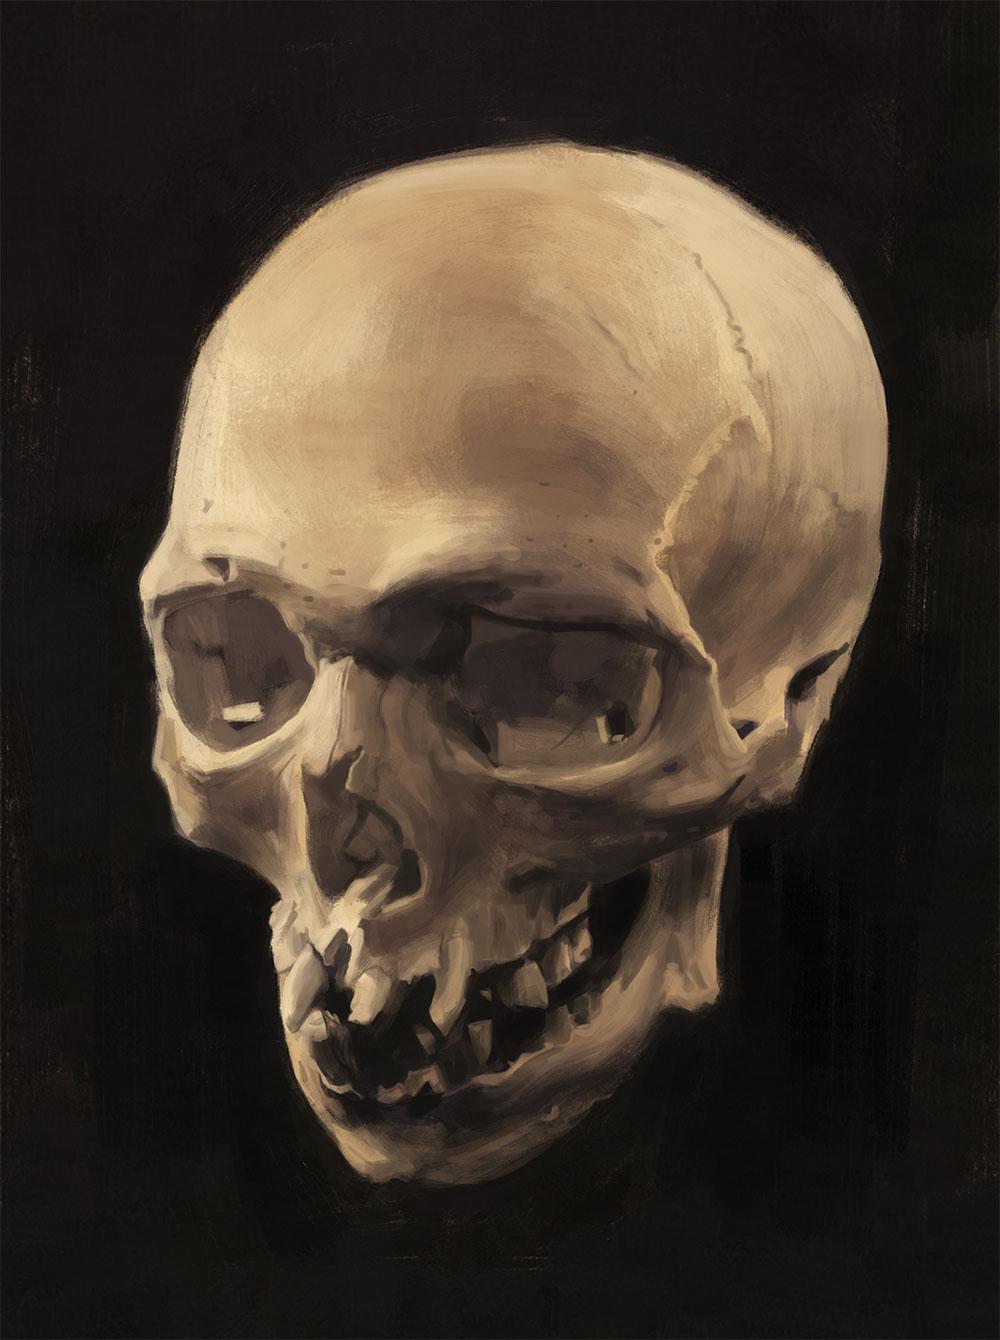 The Mystery Skull